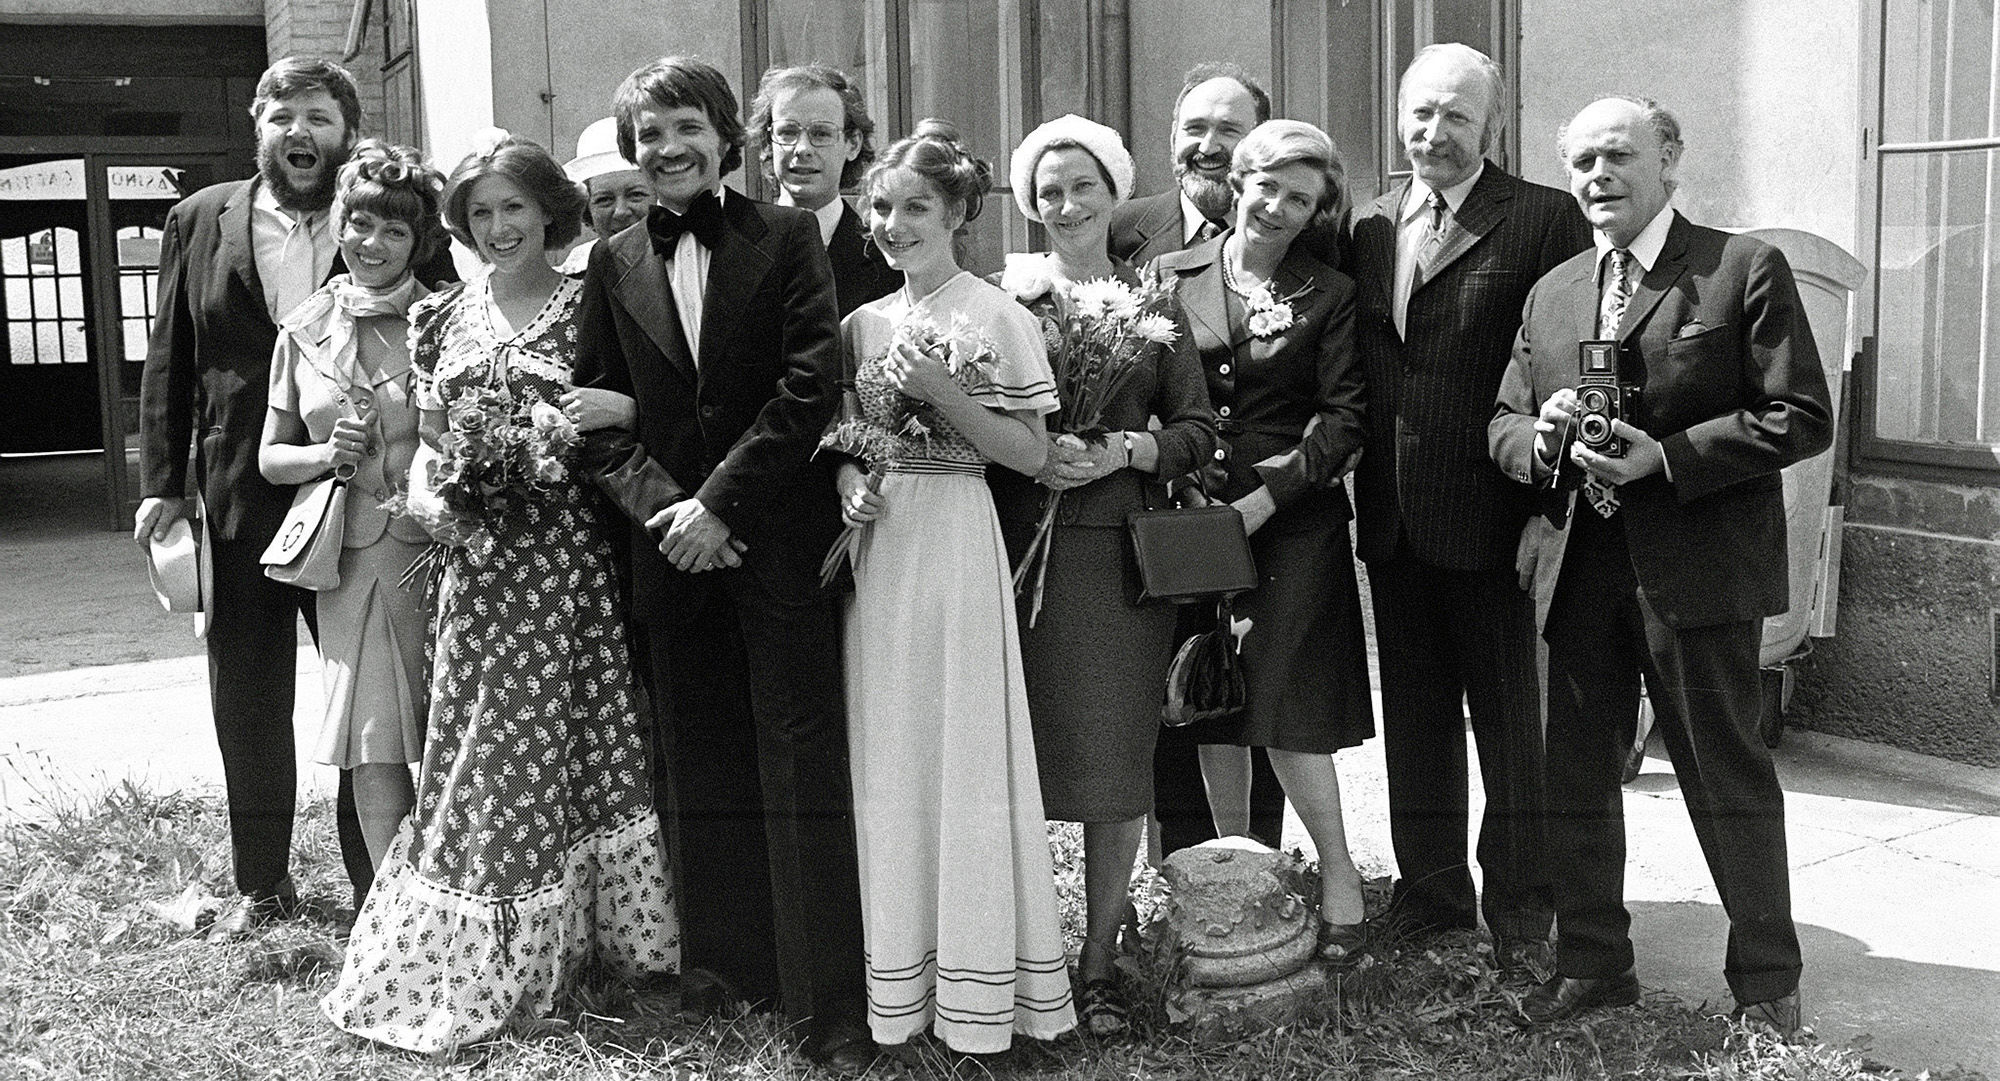 Kurti (Götz Kauffmann), Fini (Dolores Schmiedinger), Irmi (Liliana Nelska), Frau Vejvoda (Julia Gschnitzer), Karli (Klaus Rott), Franzi (Alexander Wächter), Hanni (Erika Deutinger), Toni (Ingrid Buckhard), Martha Werner (Ilse Hanel), Herr Werner (Joromi